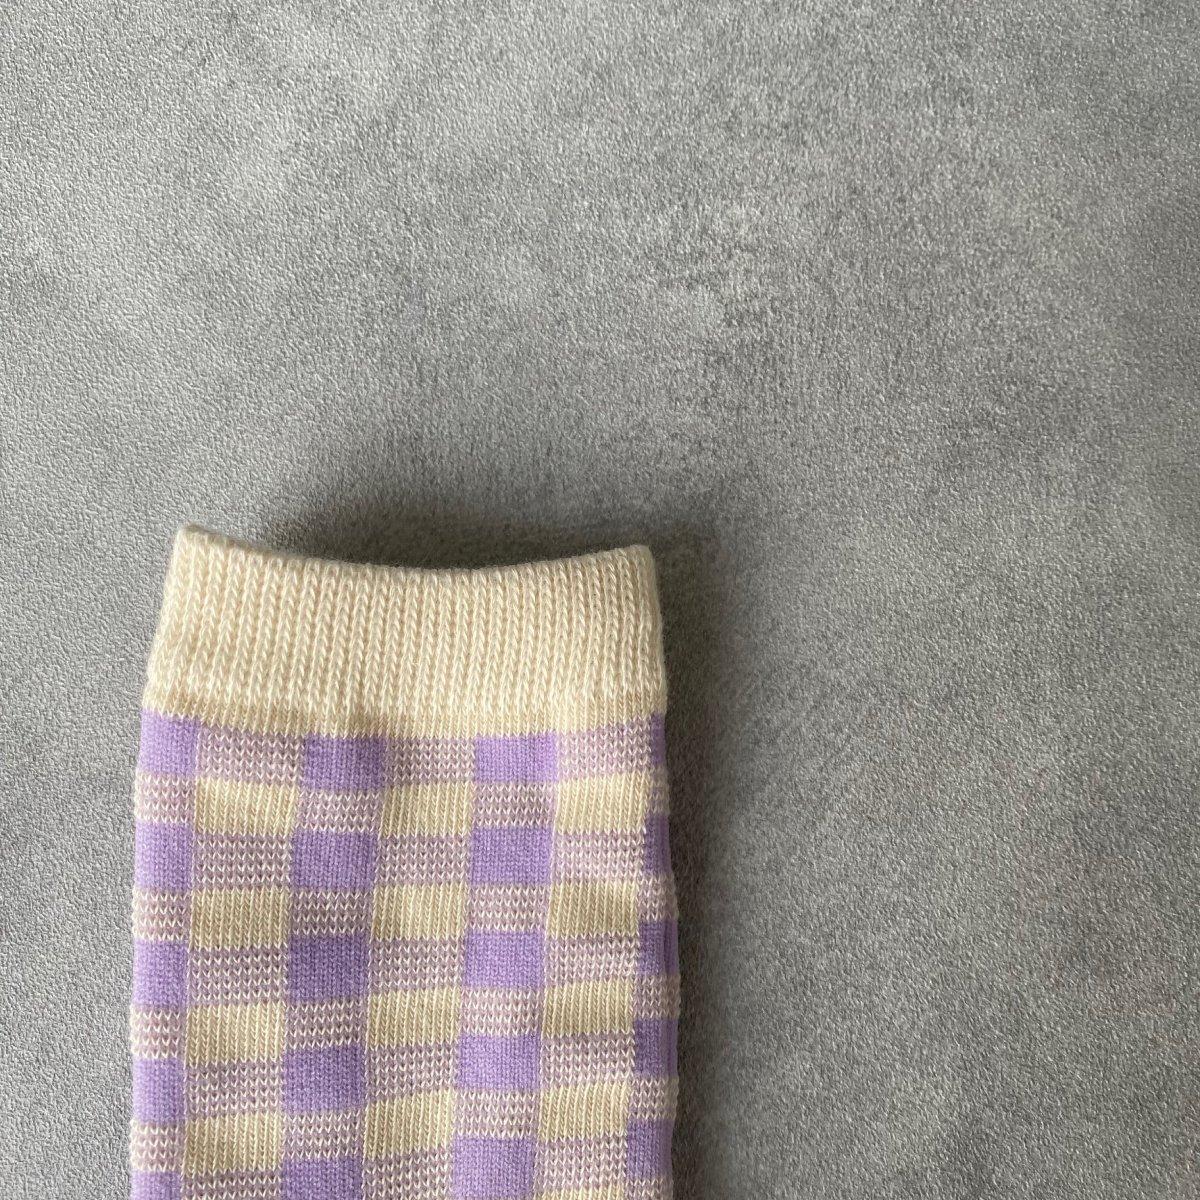 【BABY】Natural Check Socks 詳細画像9